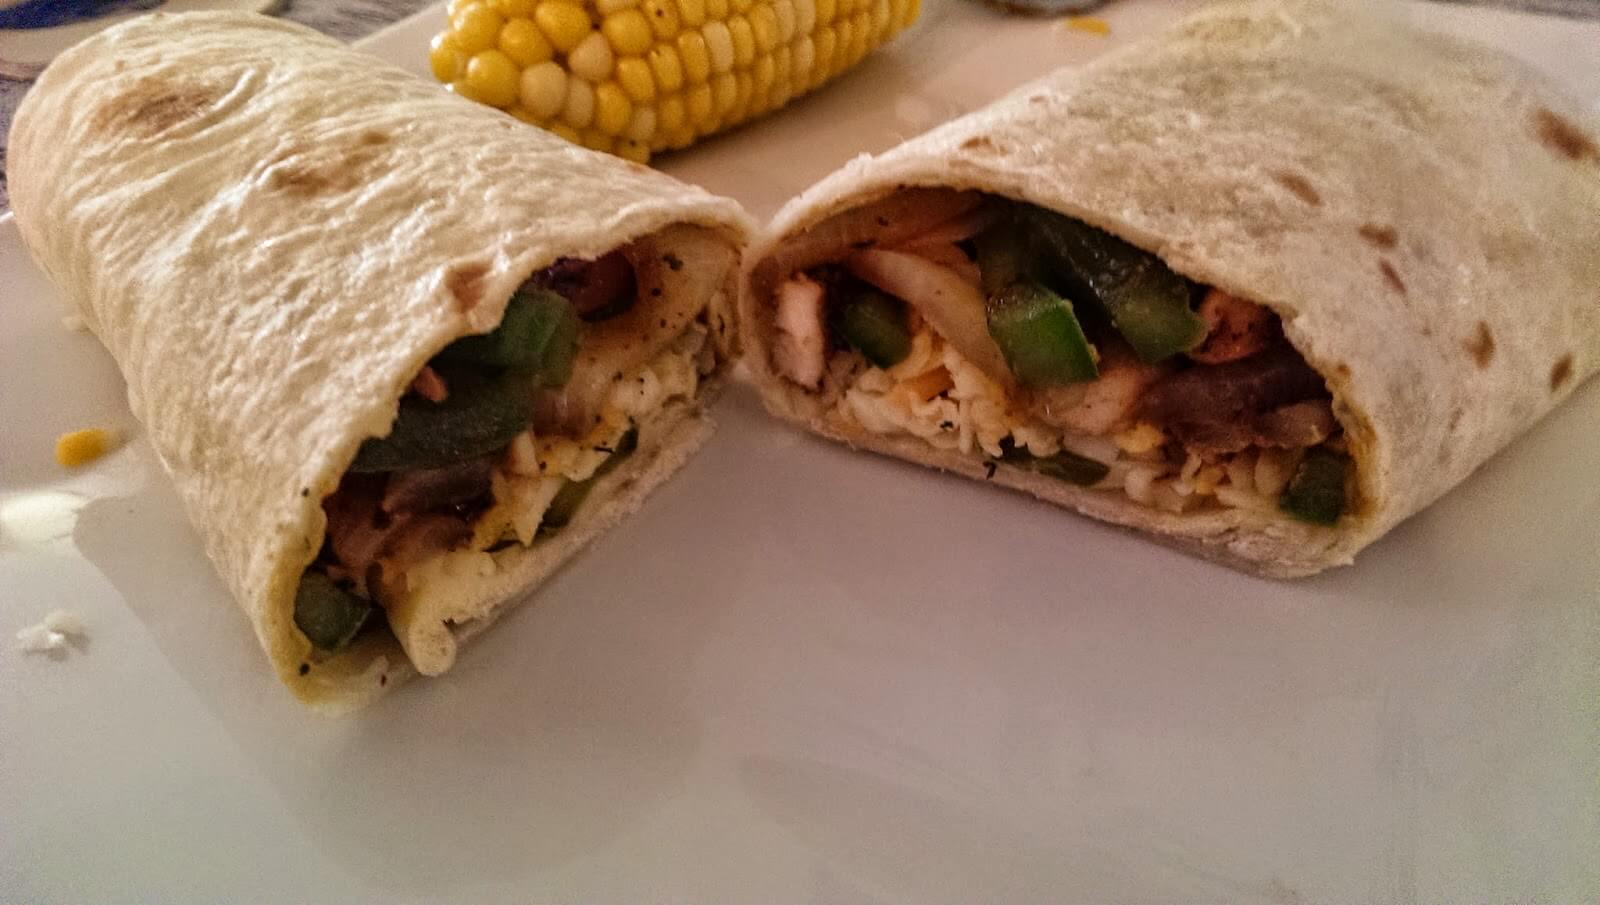 chicken fajitas in tortilla shells for lunch